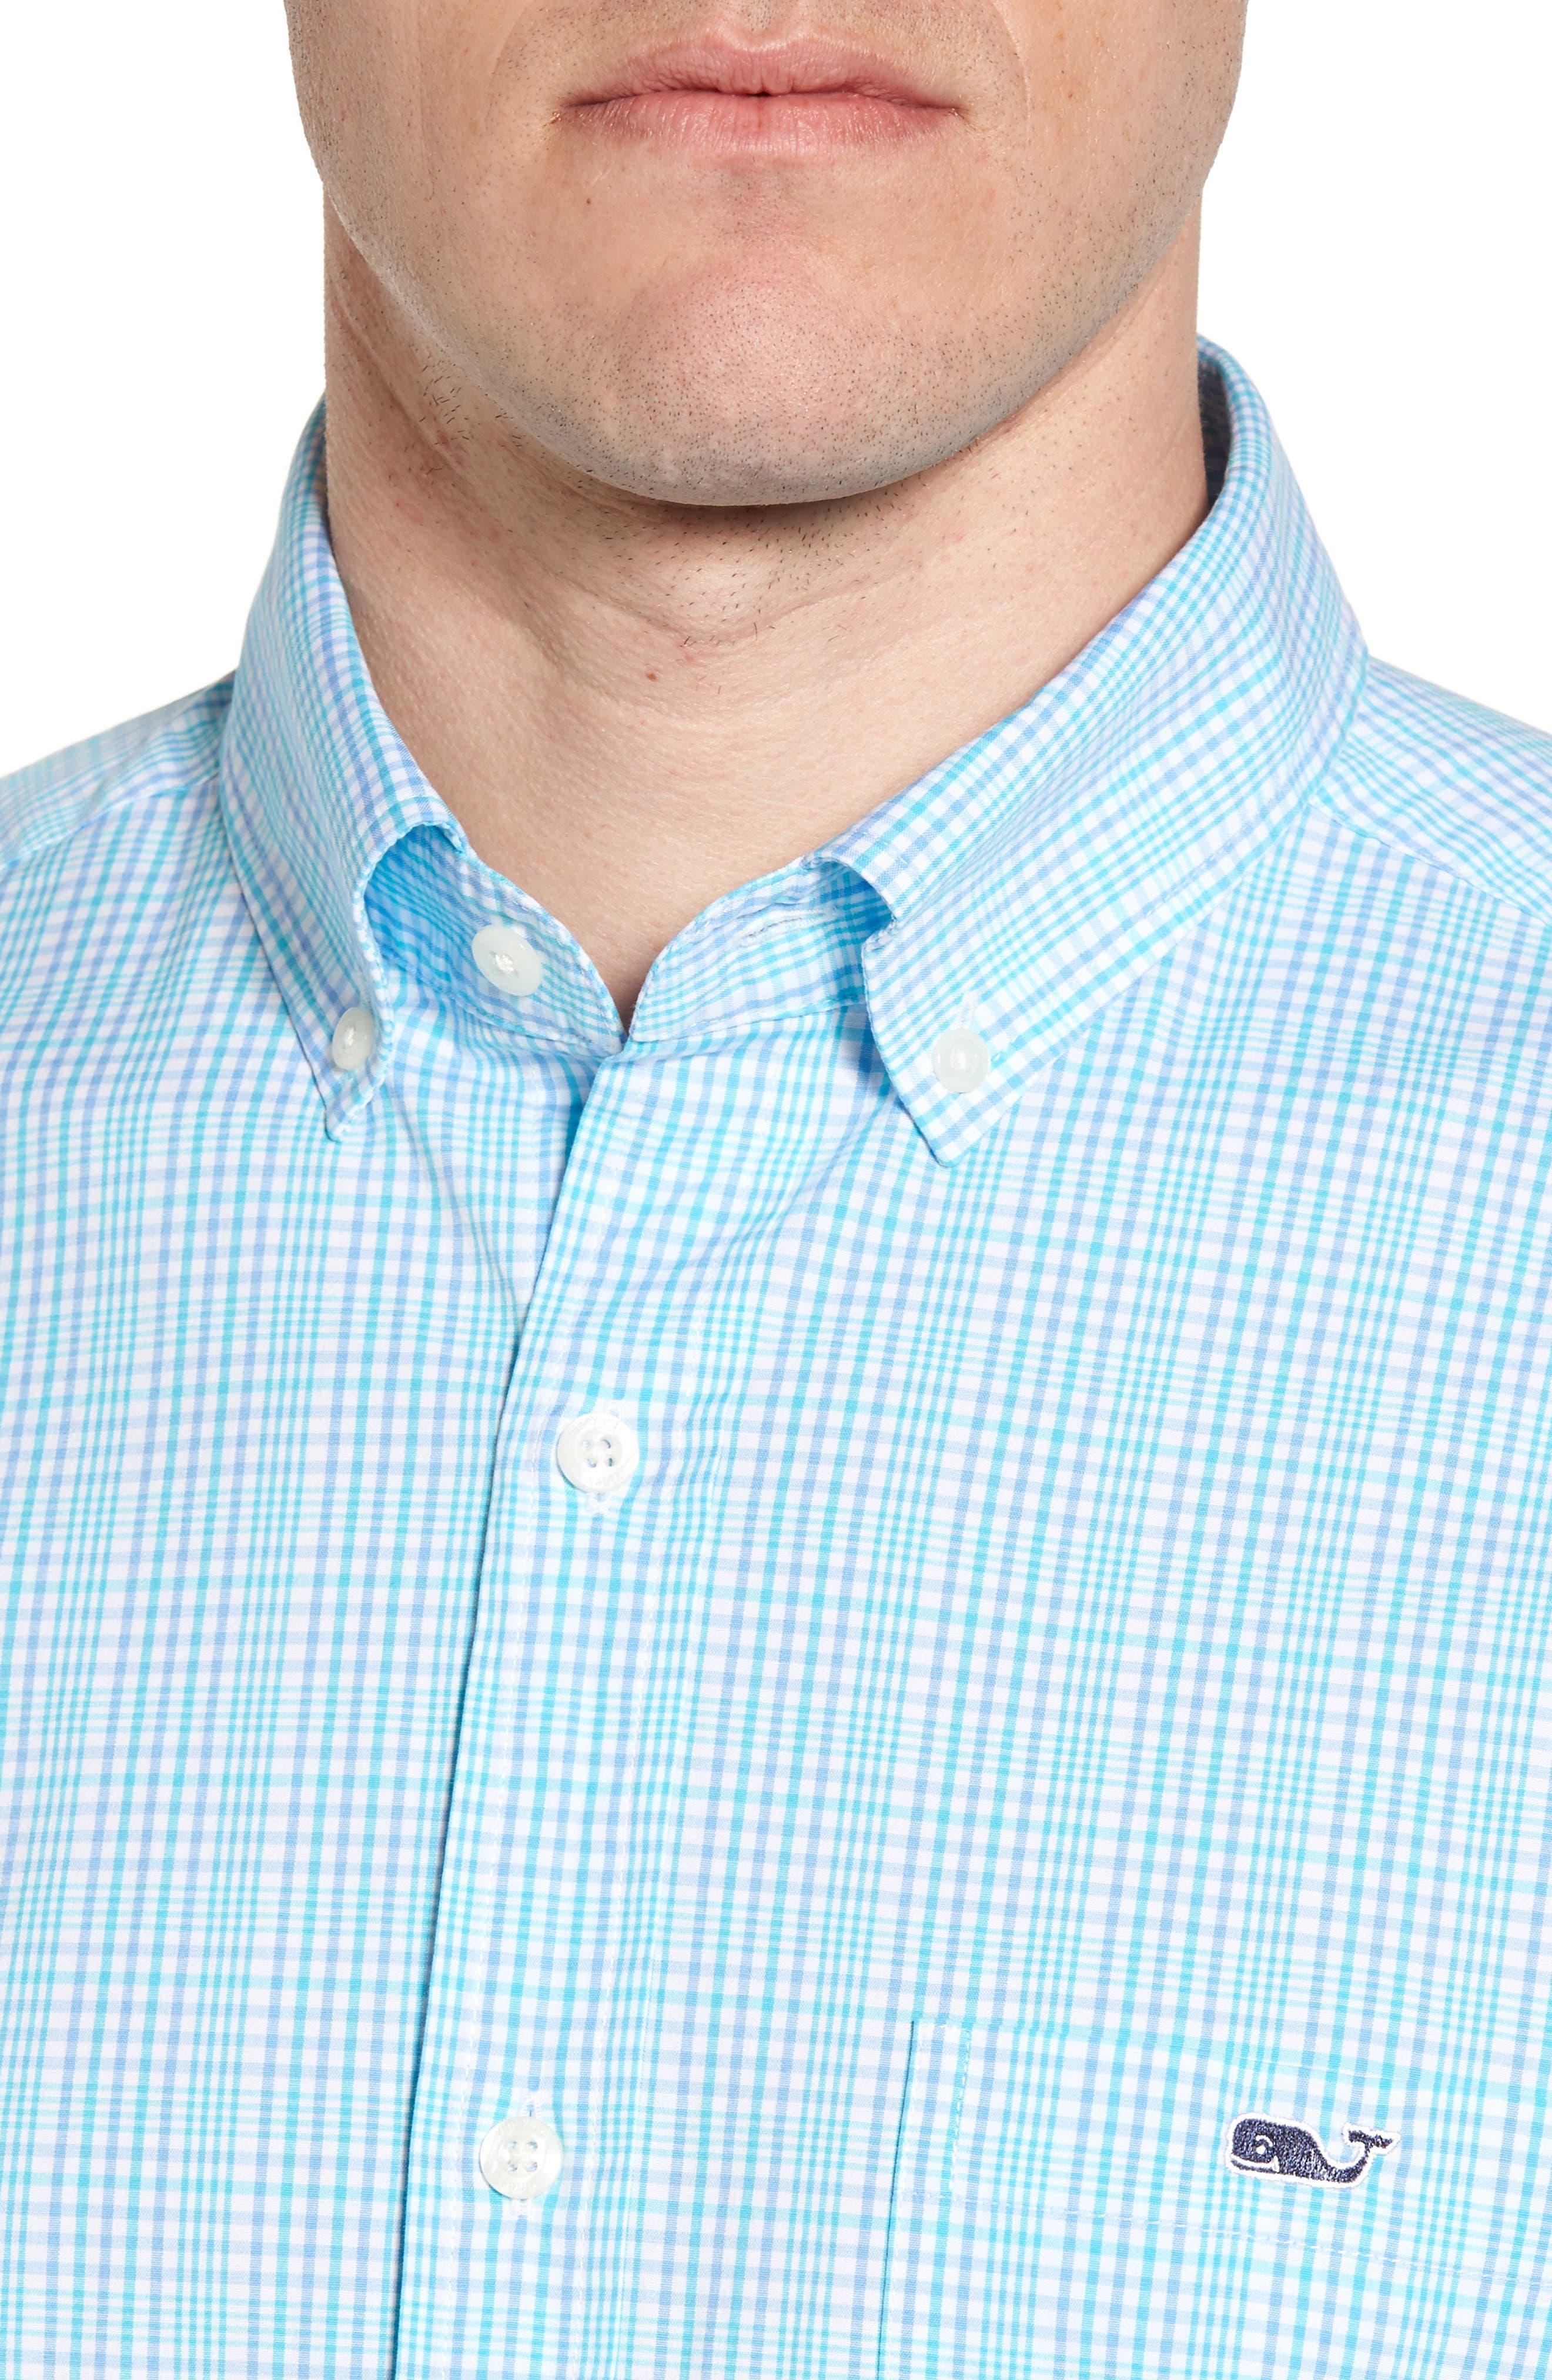 Rolling Harbor Classic Fit Plaid Sport Shirt,                             Alternate thumbnail 4, color,                             459